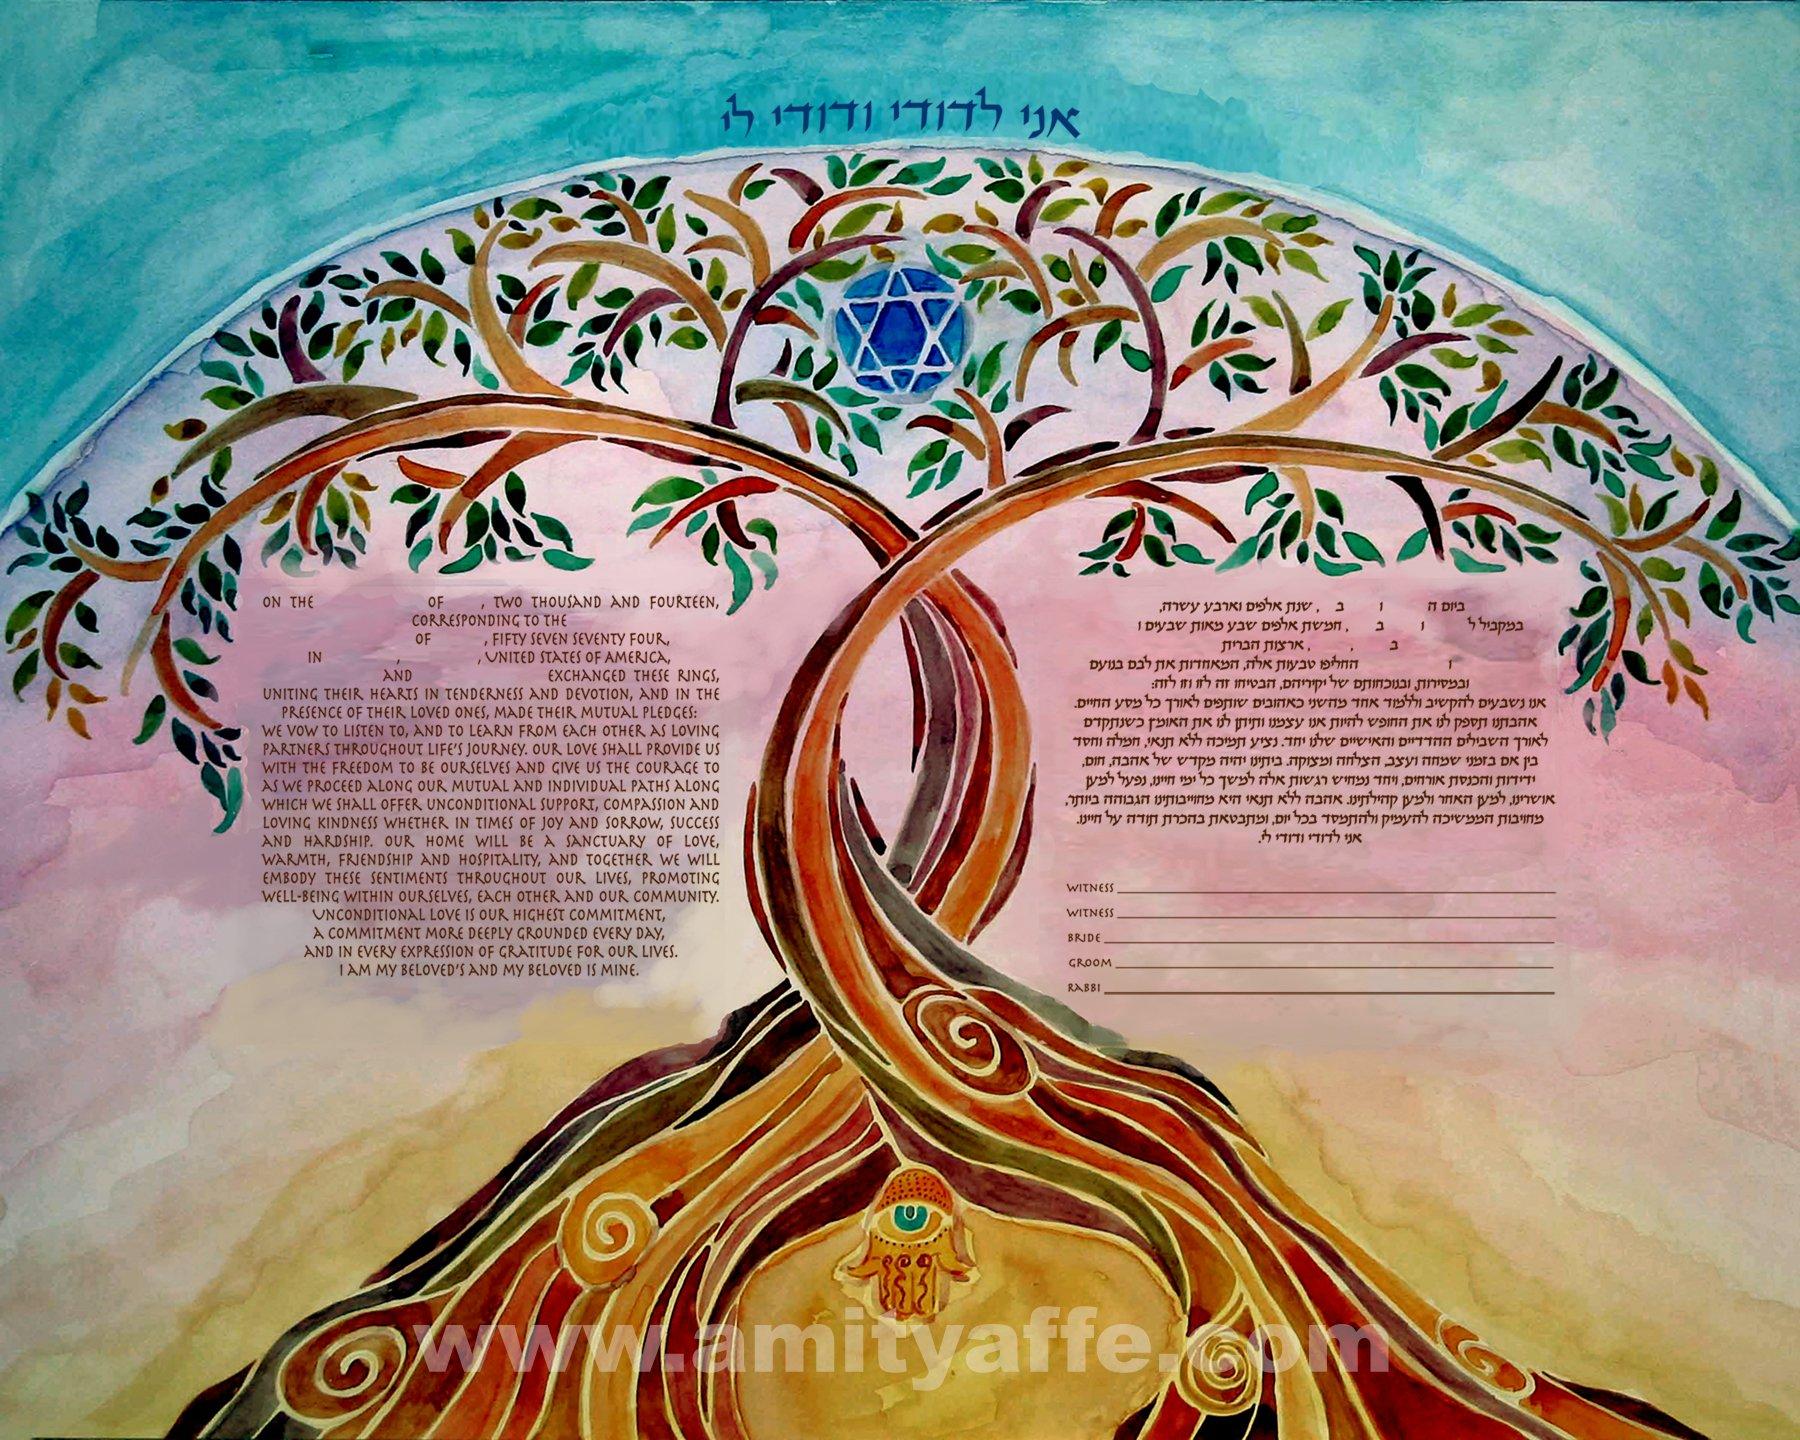 Custom Ketubah - Jewish Wedding Contract - Personalized Ketubah - Jewish Judaica Art - Hebrew English - Linked Trees